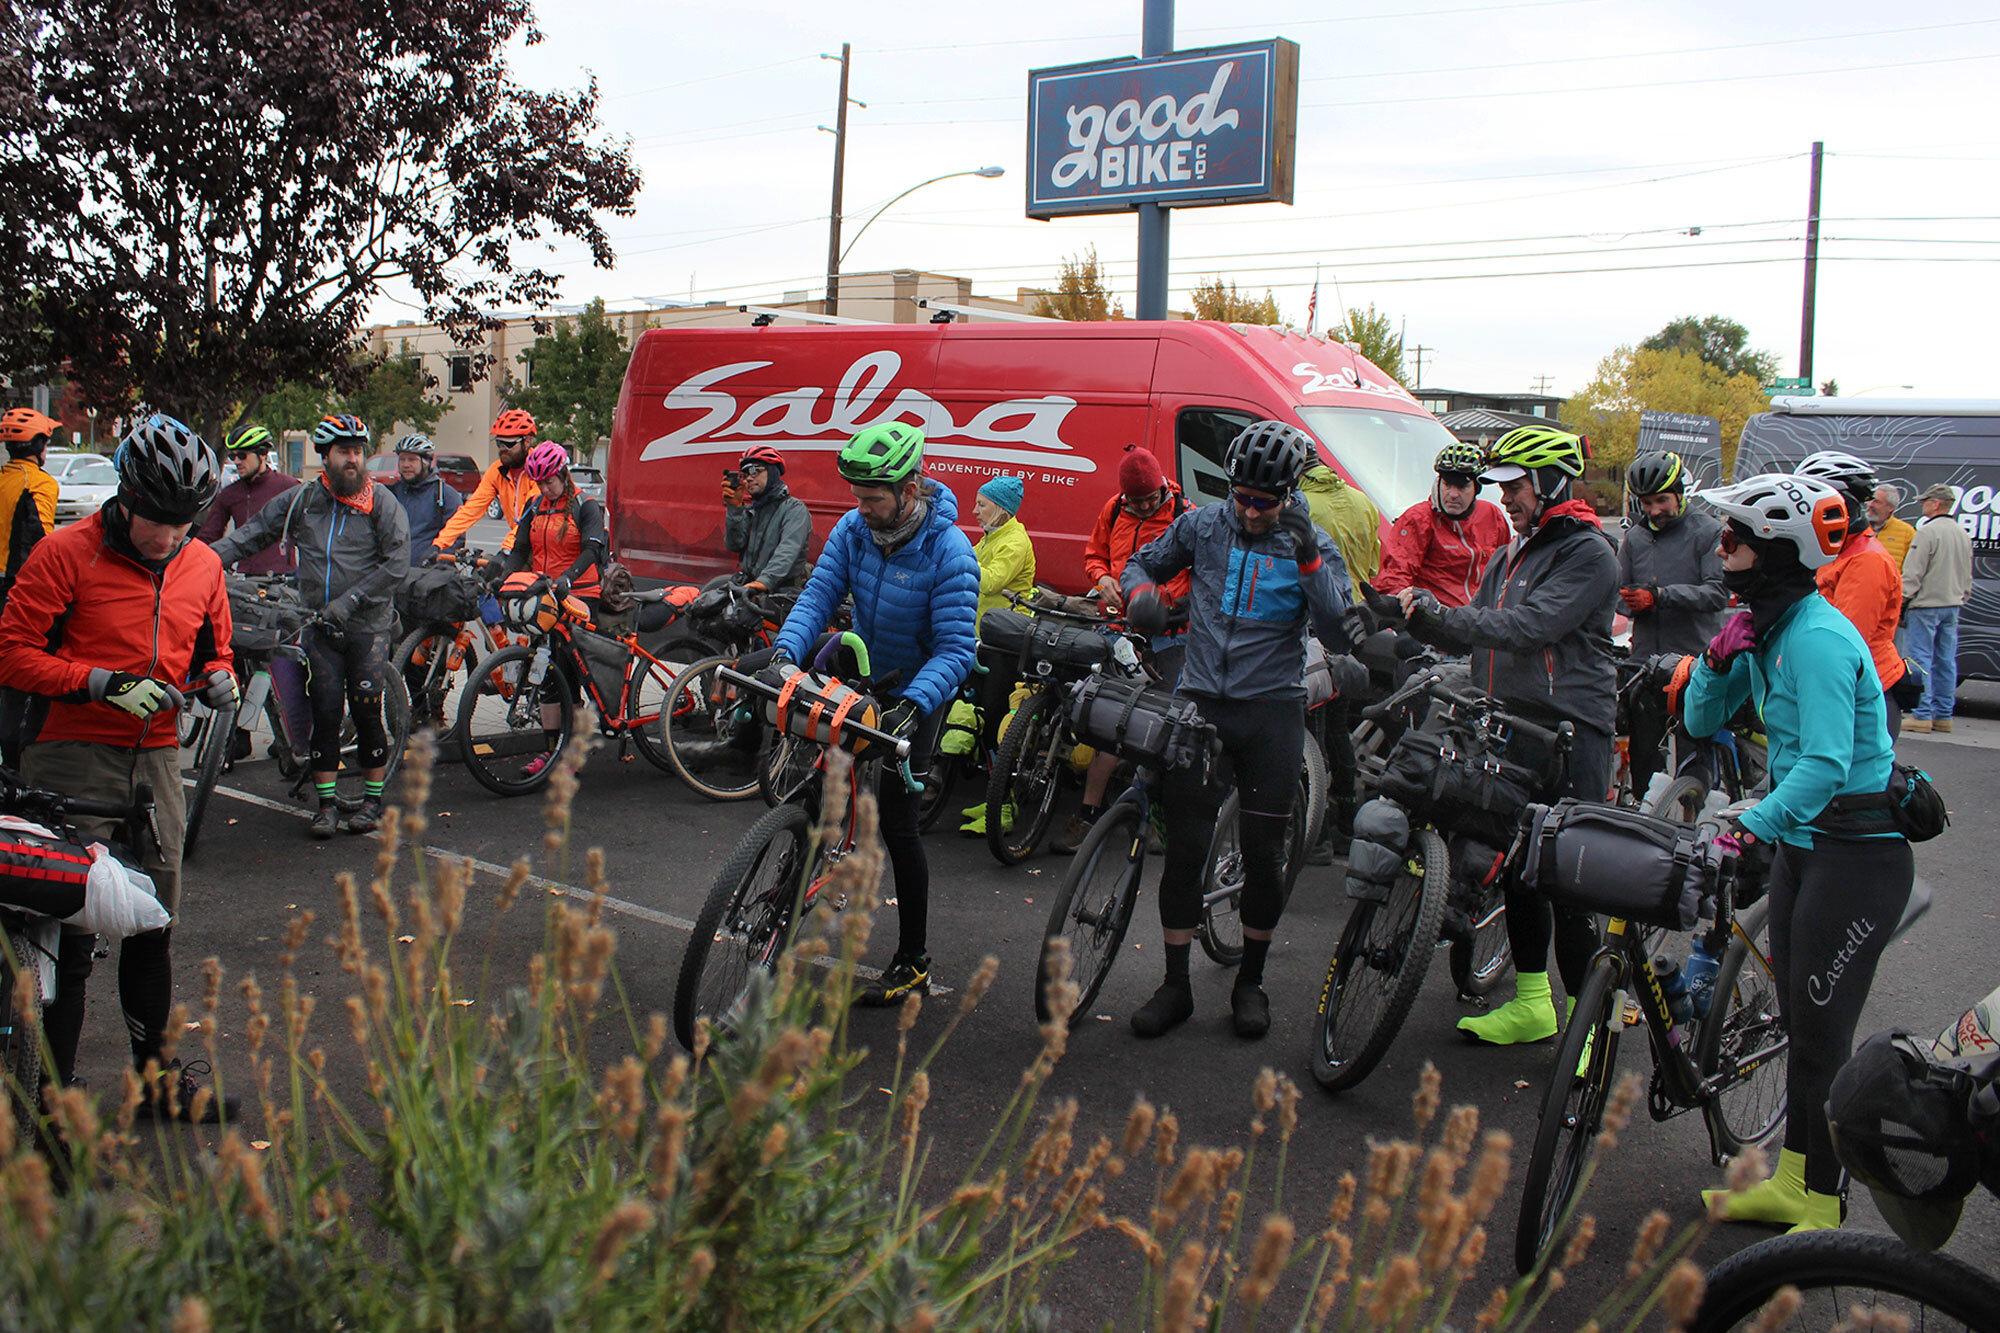 2018 Ochoco Overlander - 40 Riders4 Days220 Miles18,000+ Feet